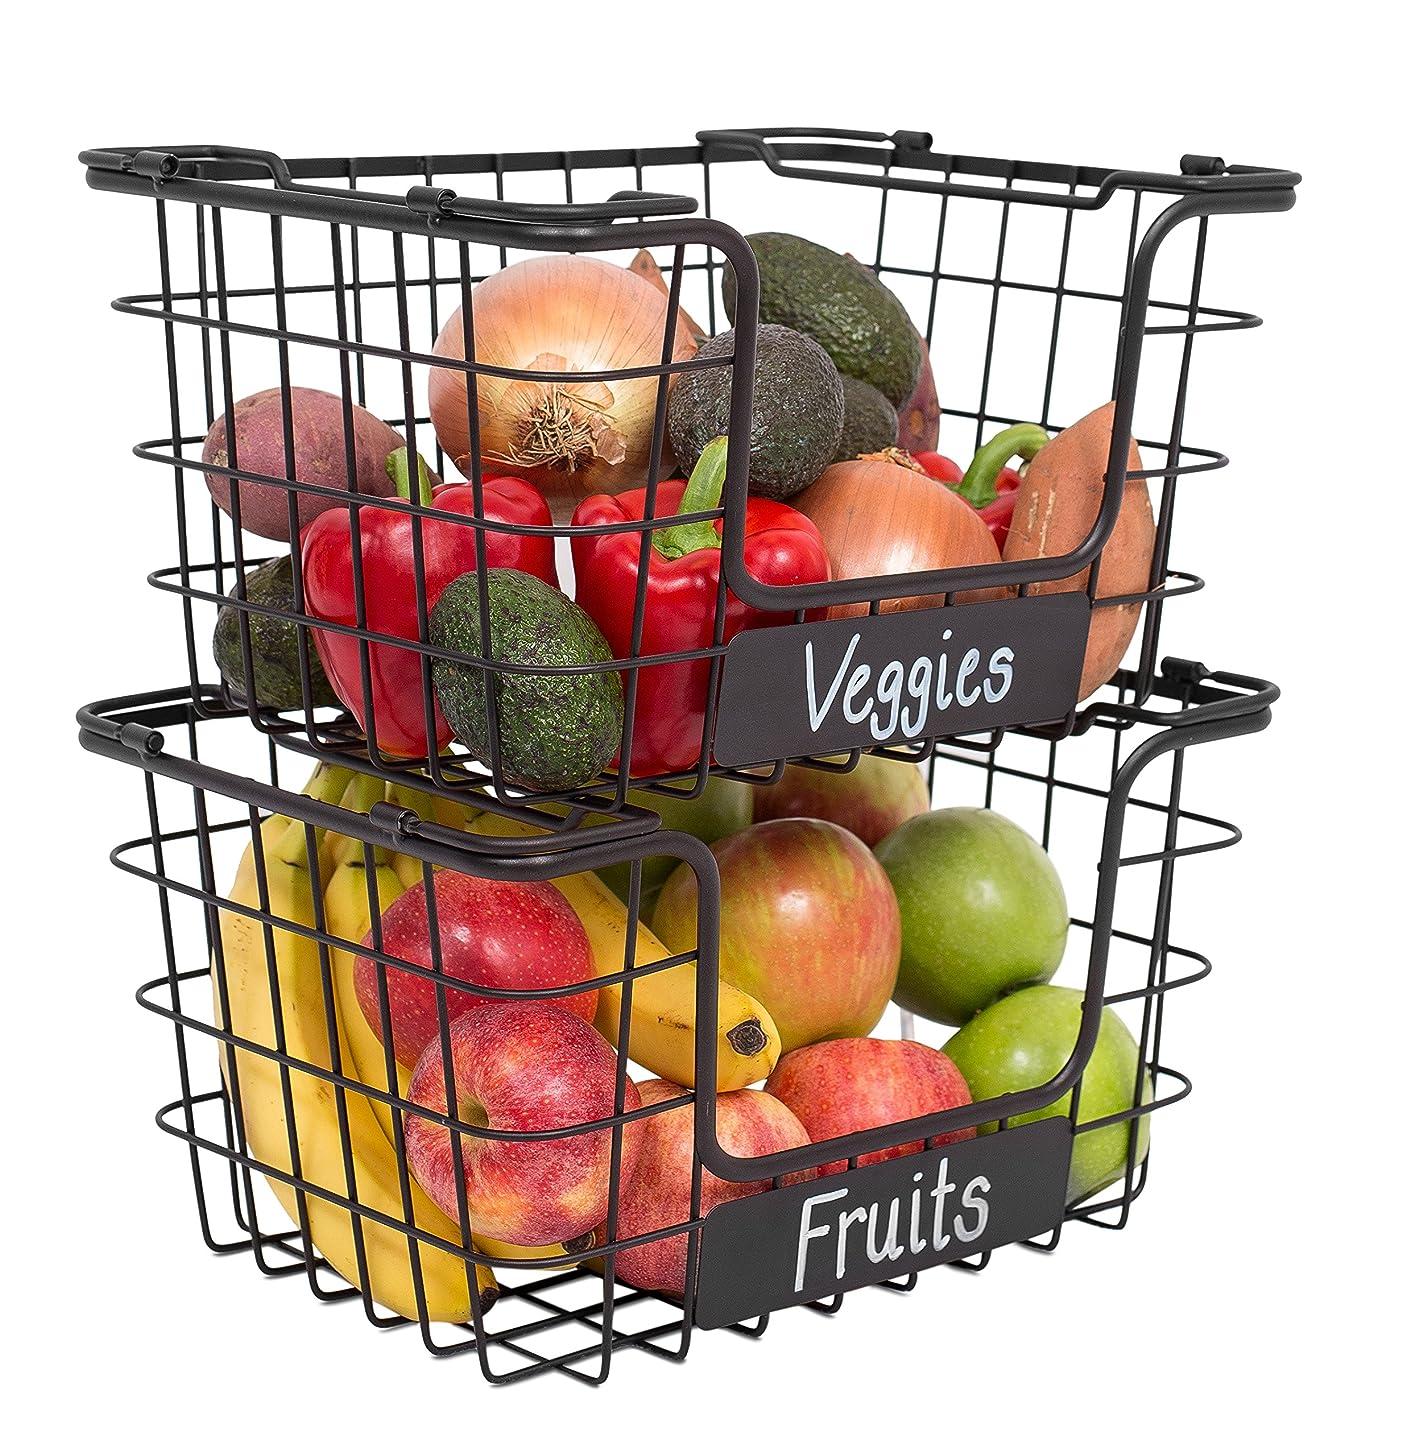 BirdRock Home Stacking Wire Market Baskets with Chalk Label   Set of 2   Fruit Vegetable Produce Metal Storage Bin for Kitchen Counter   Black